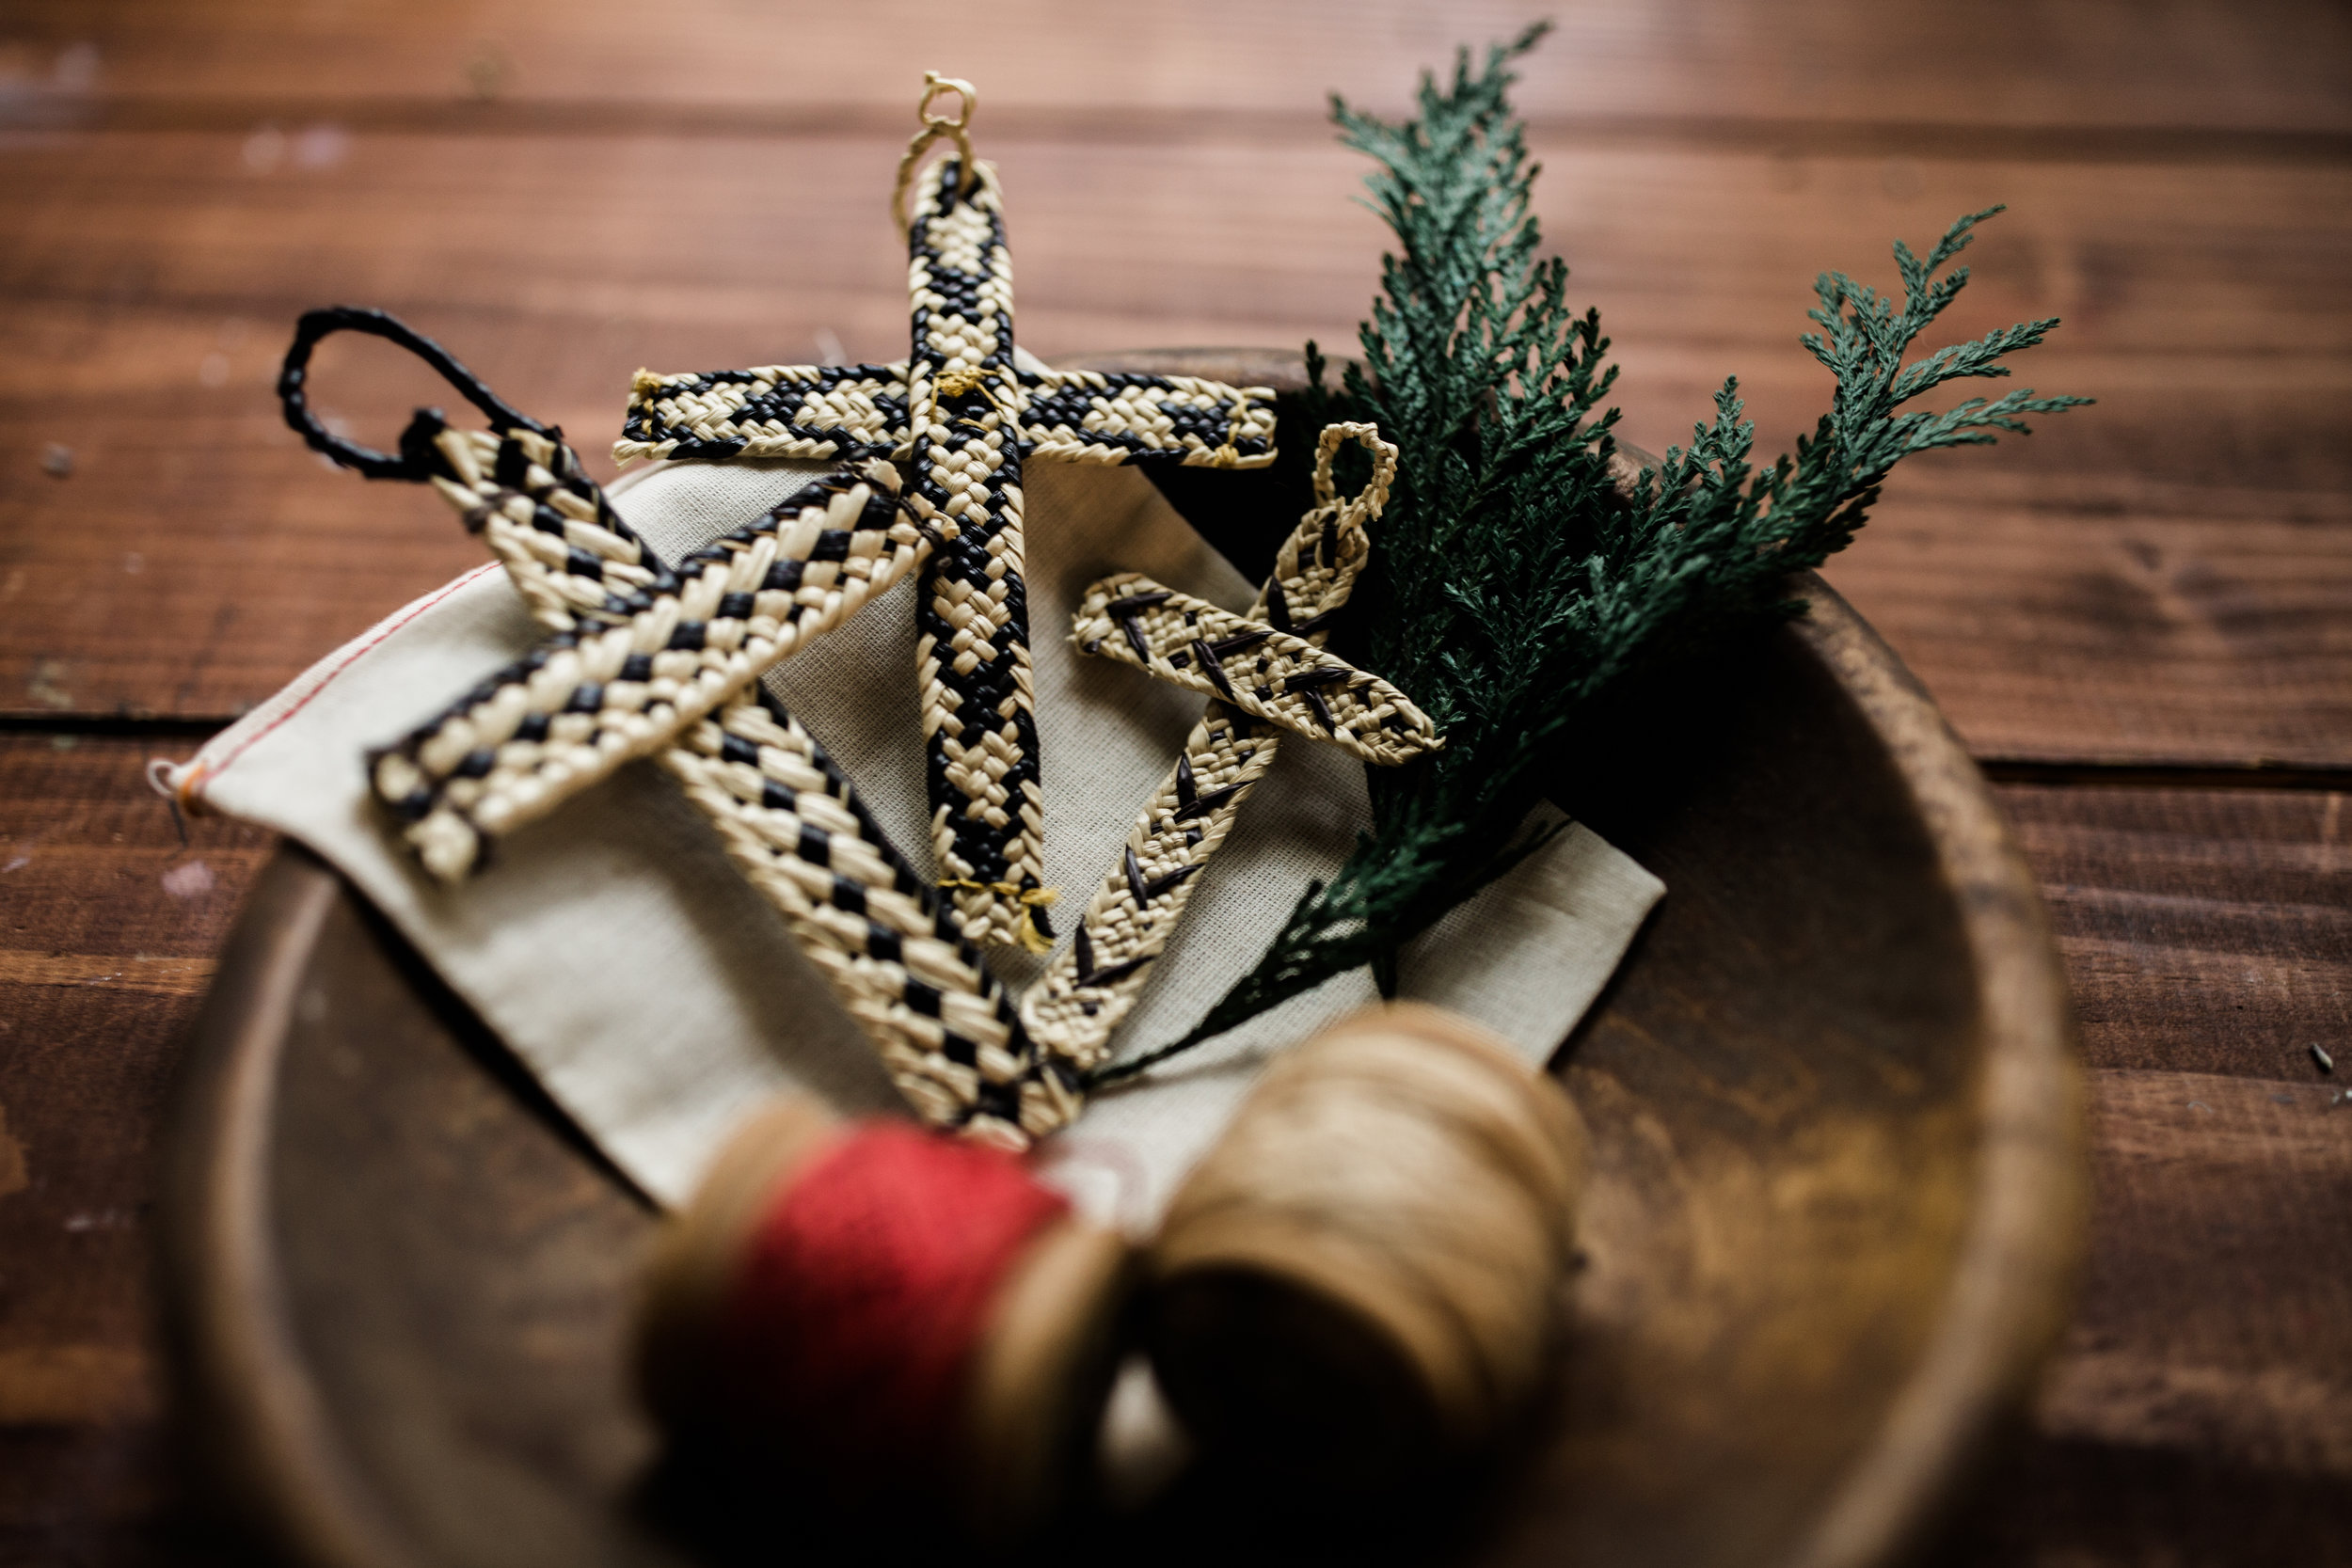 hands-producing-hope-costa-rica-christmas-crosses-0071.jpg